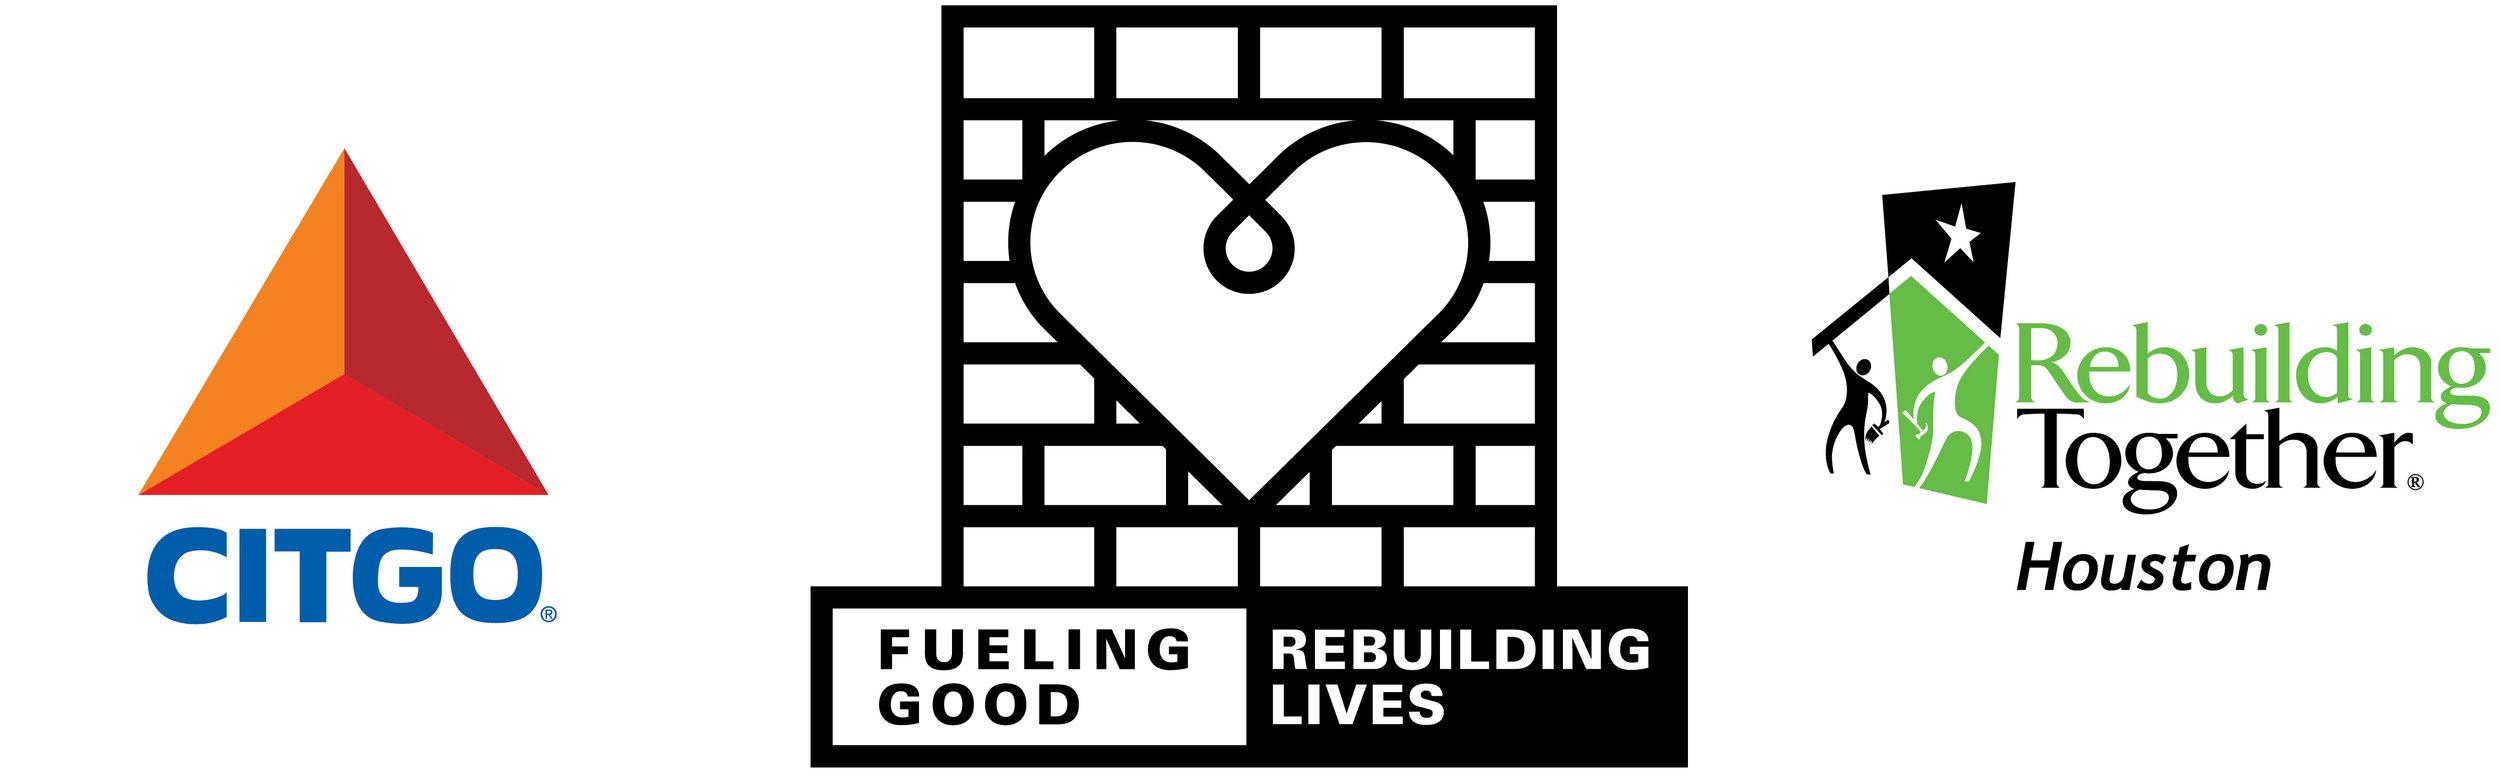 CITGO_Rebuild Together_Logo Layout.jpg